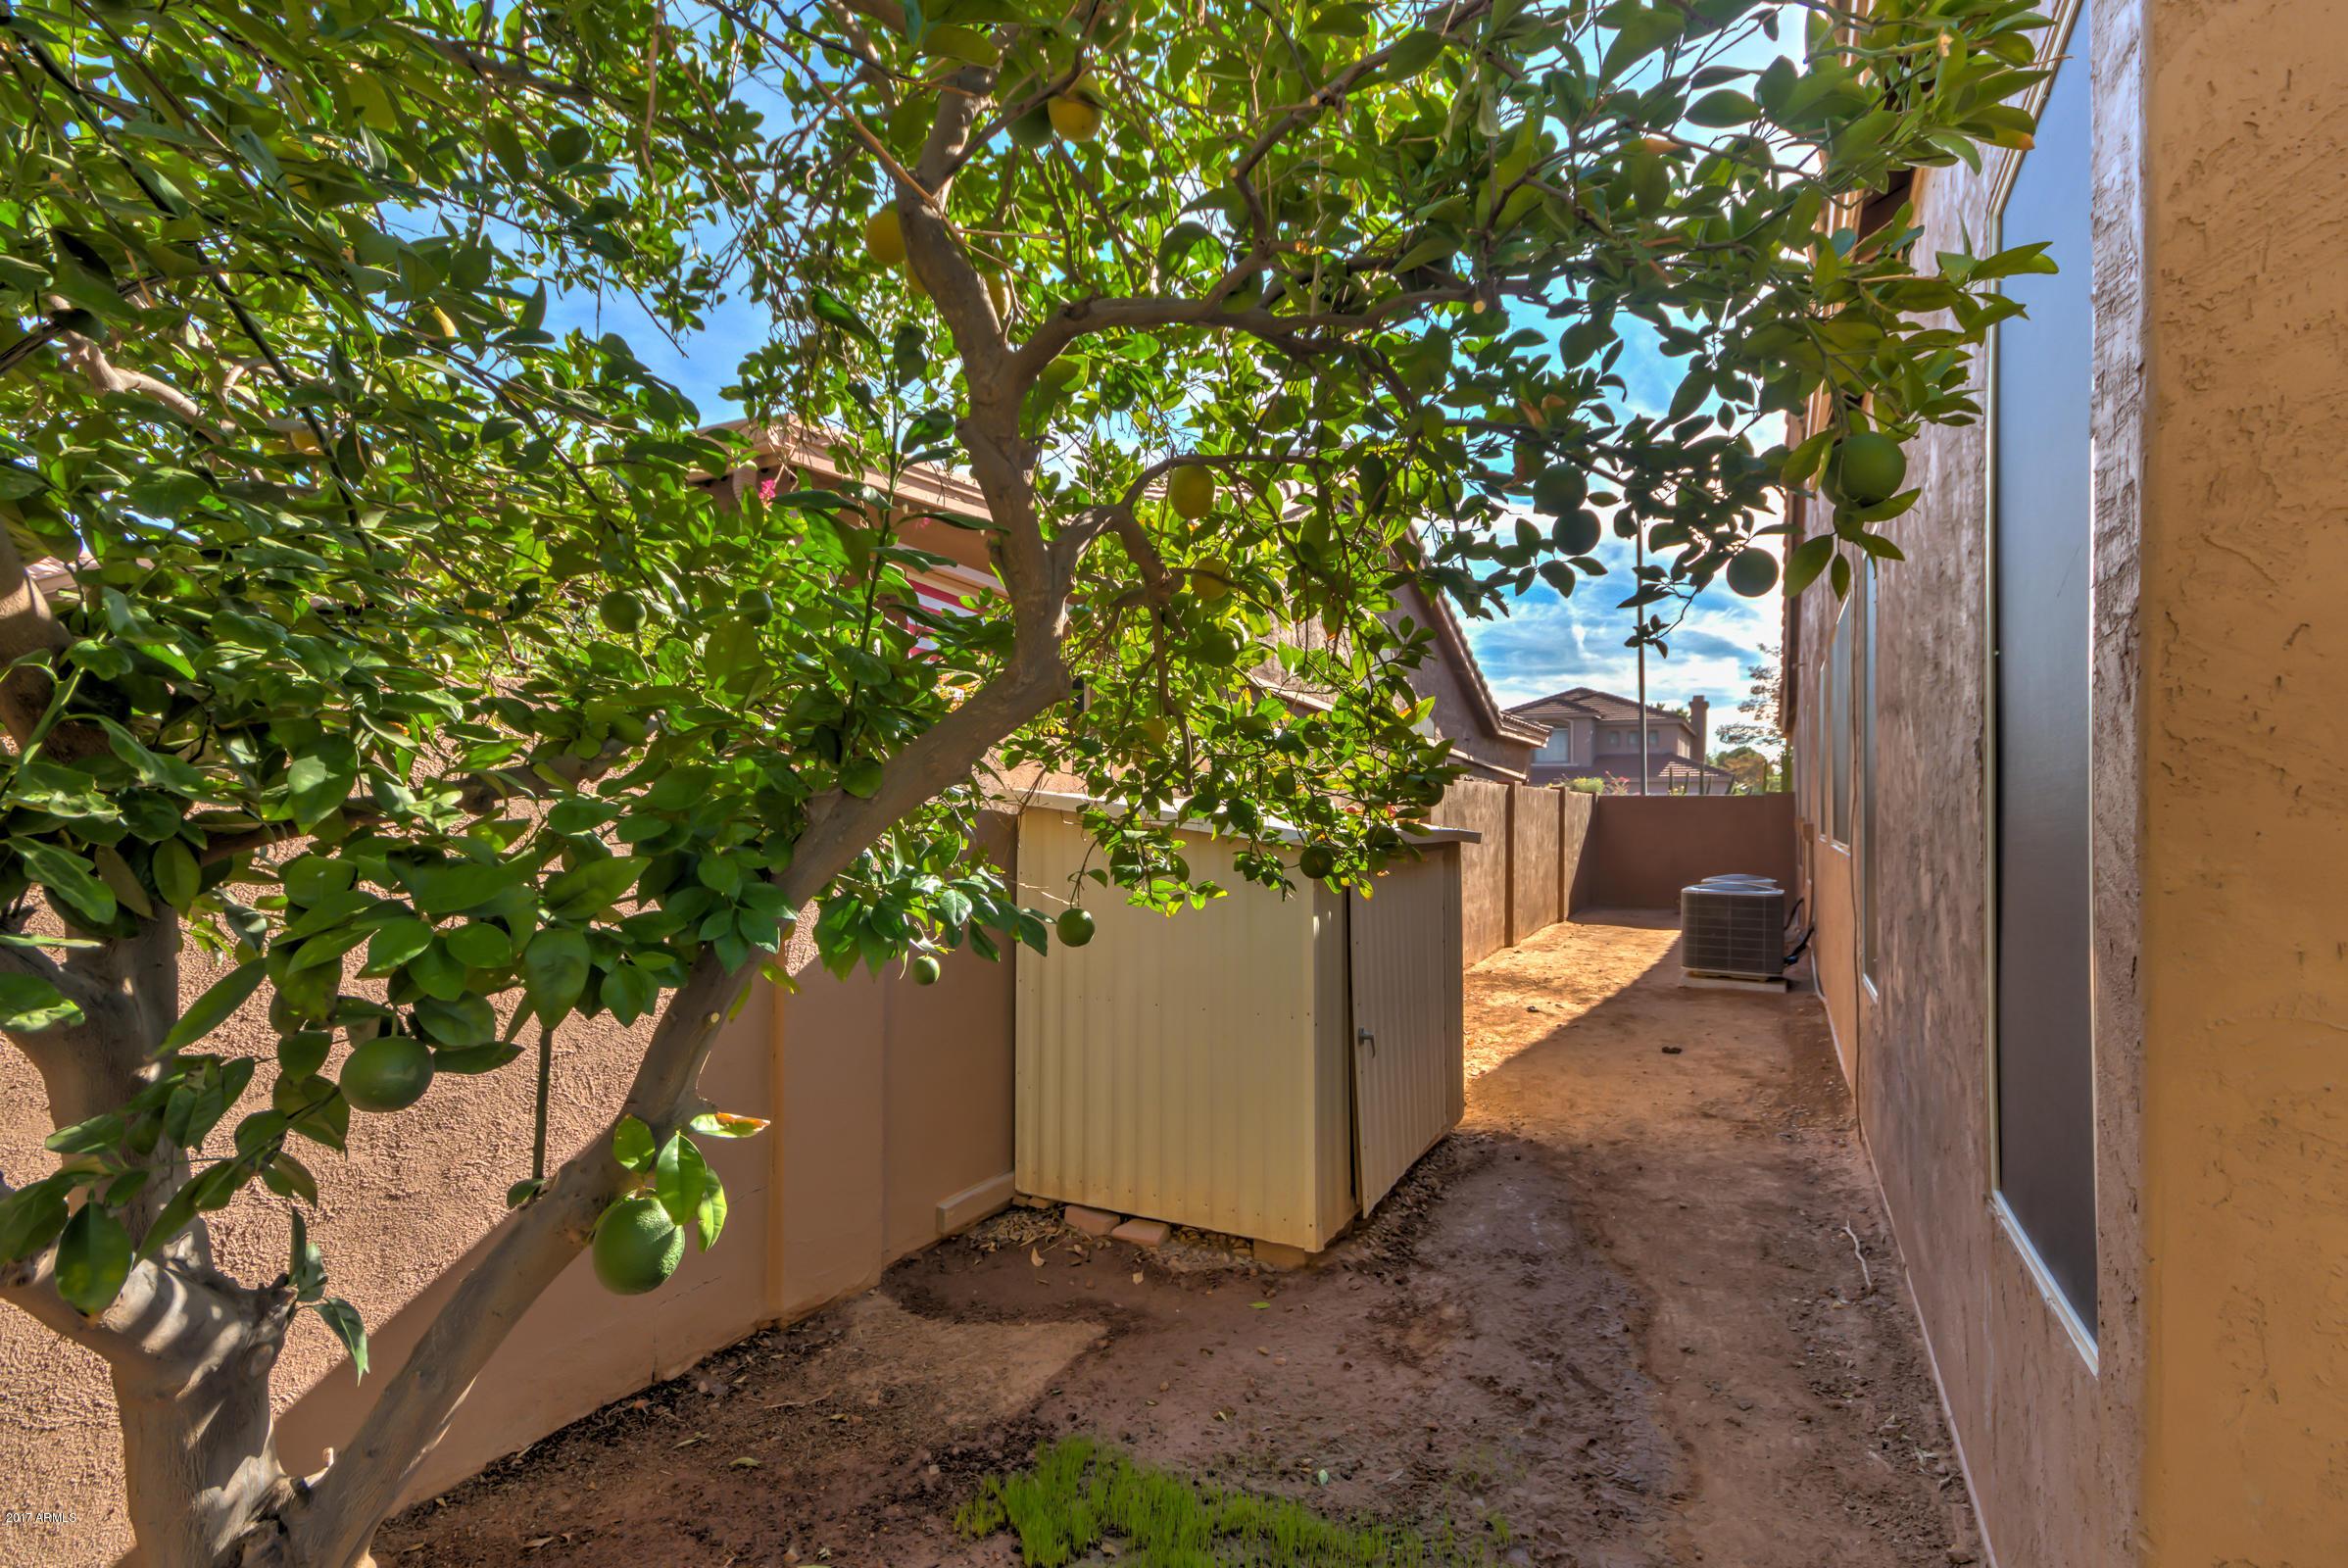 304 S Ironwood  Street Gilbert, AZ 85296 - img44